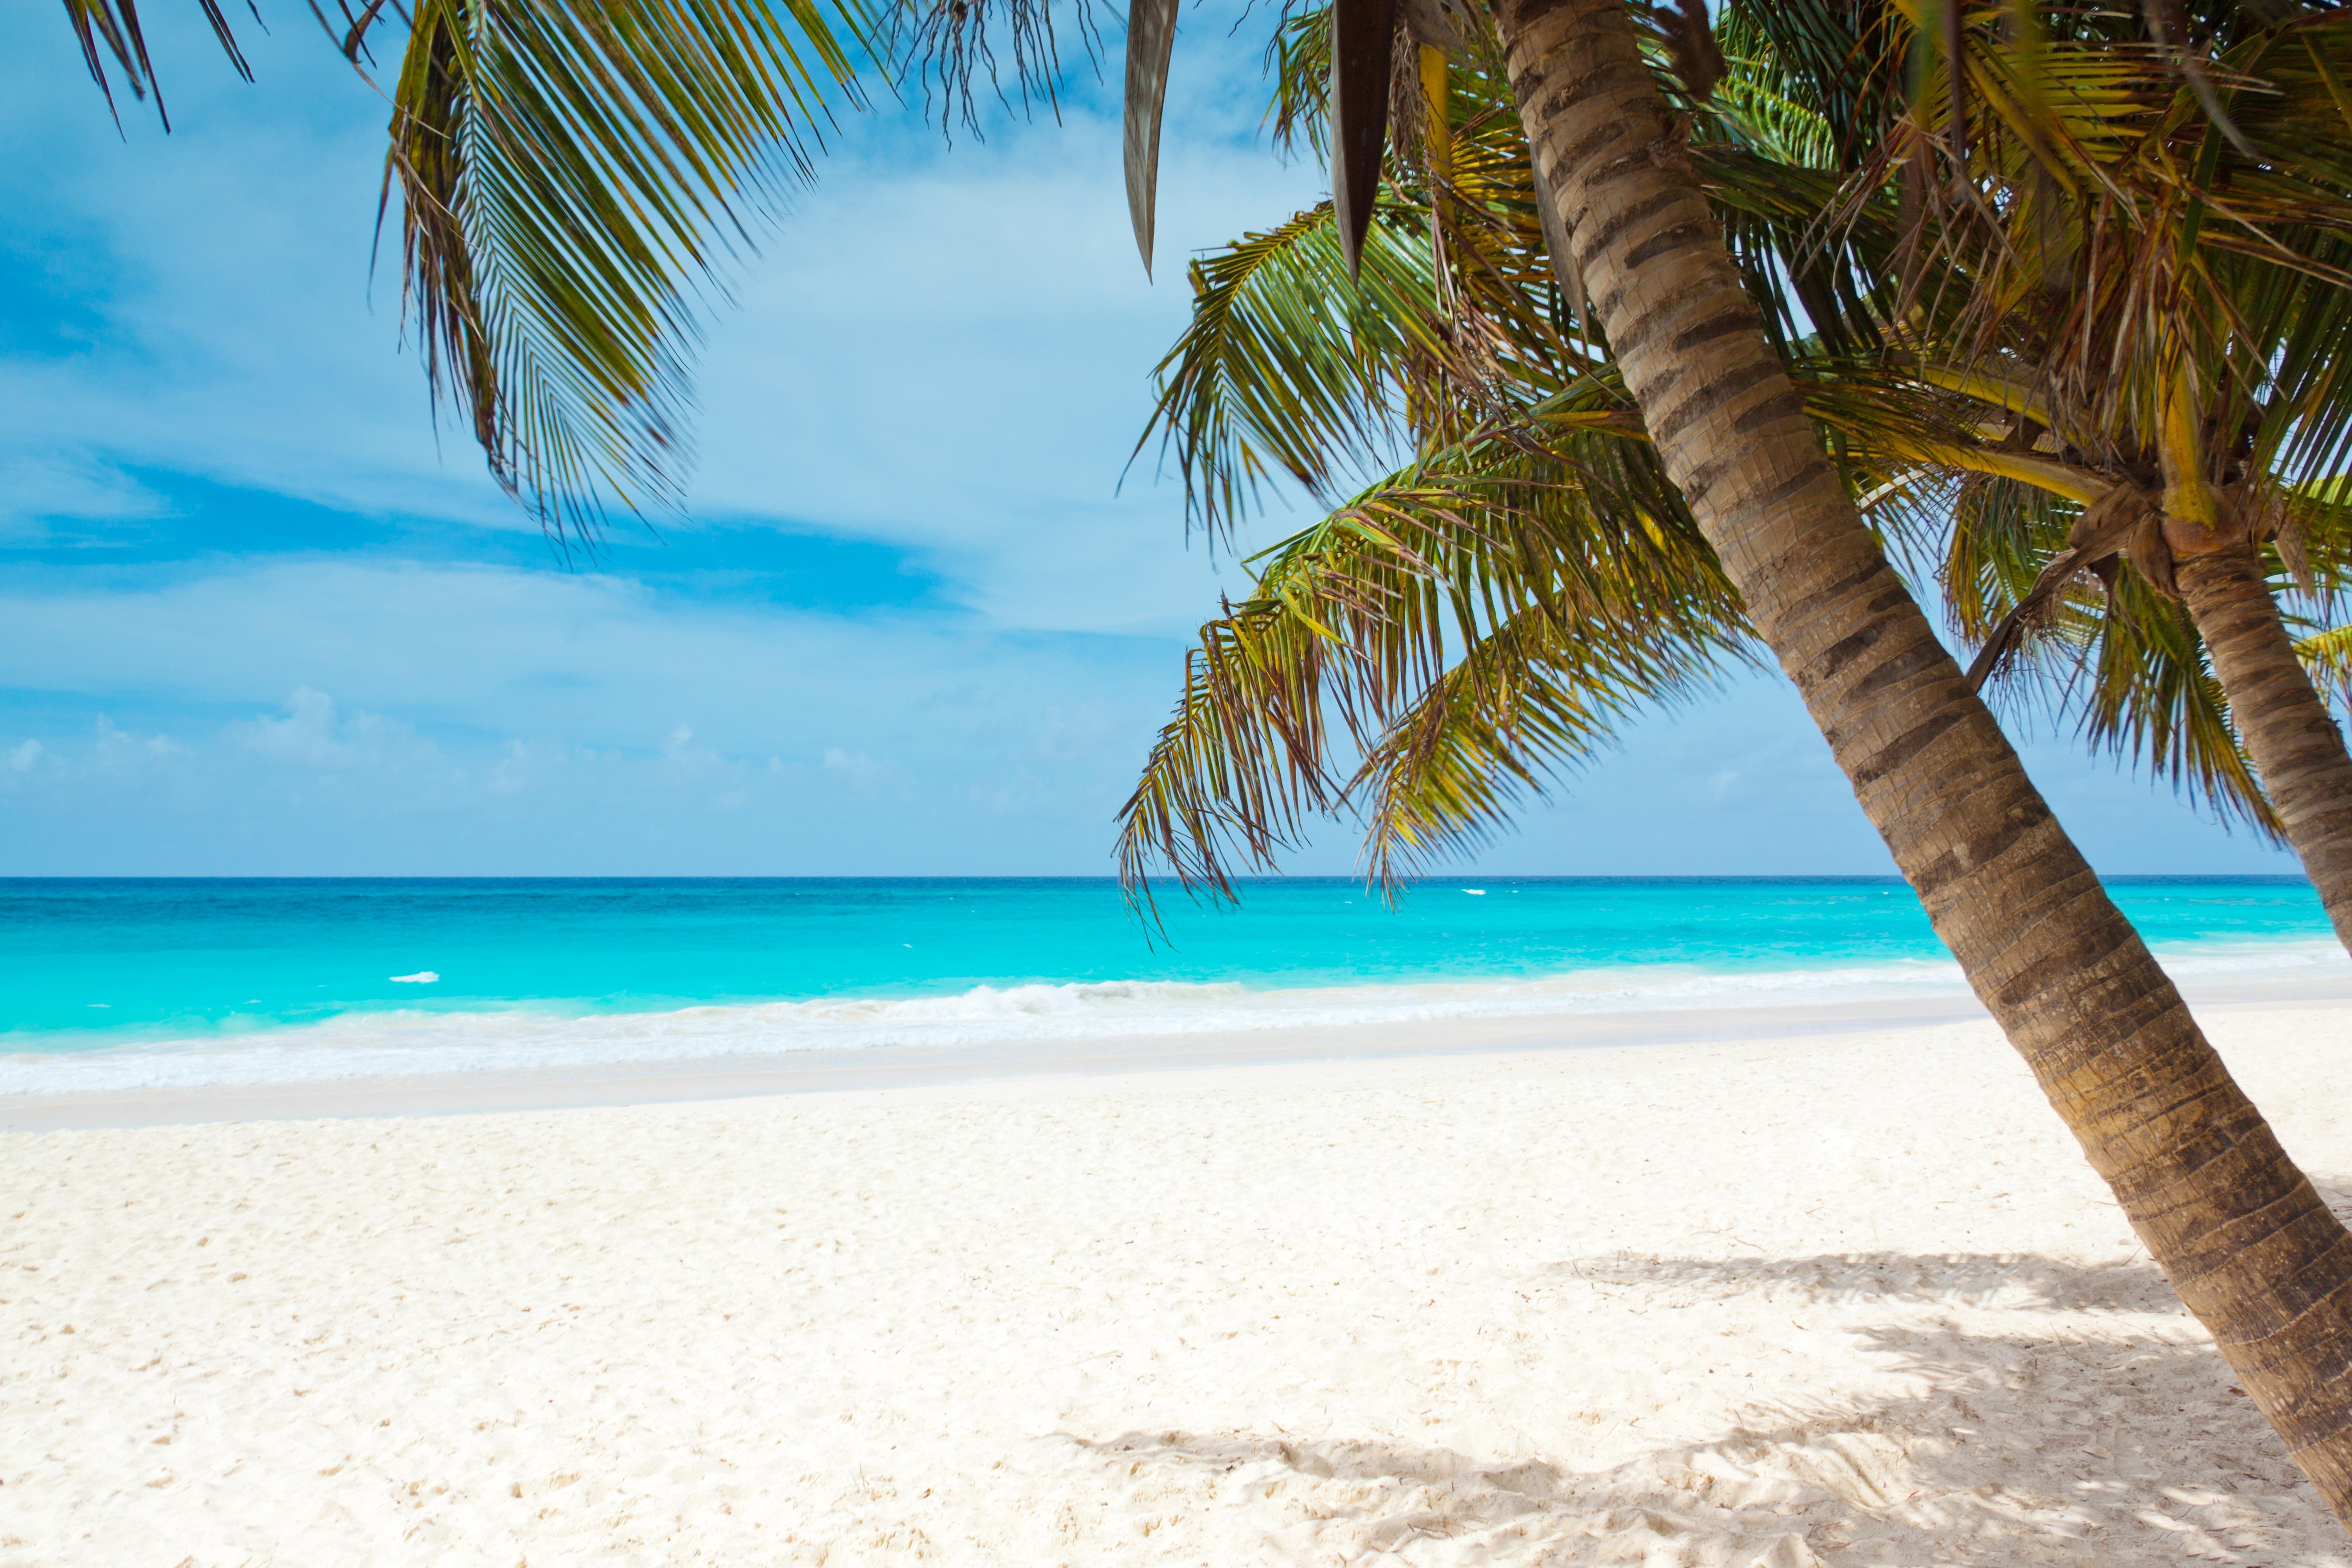 Free Images : Beach, Landscape, Sea, Coast, Sand, Ocean